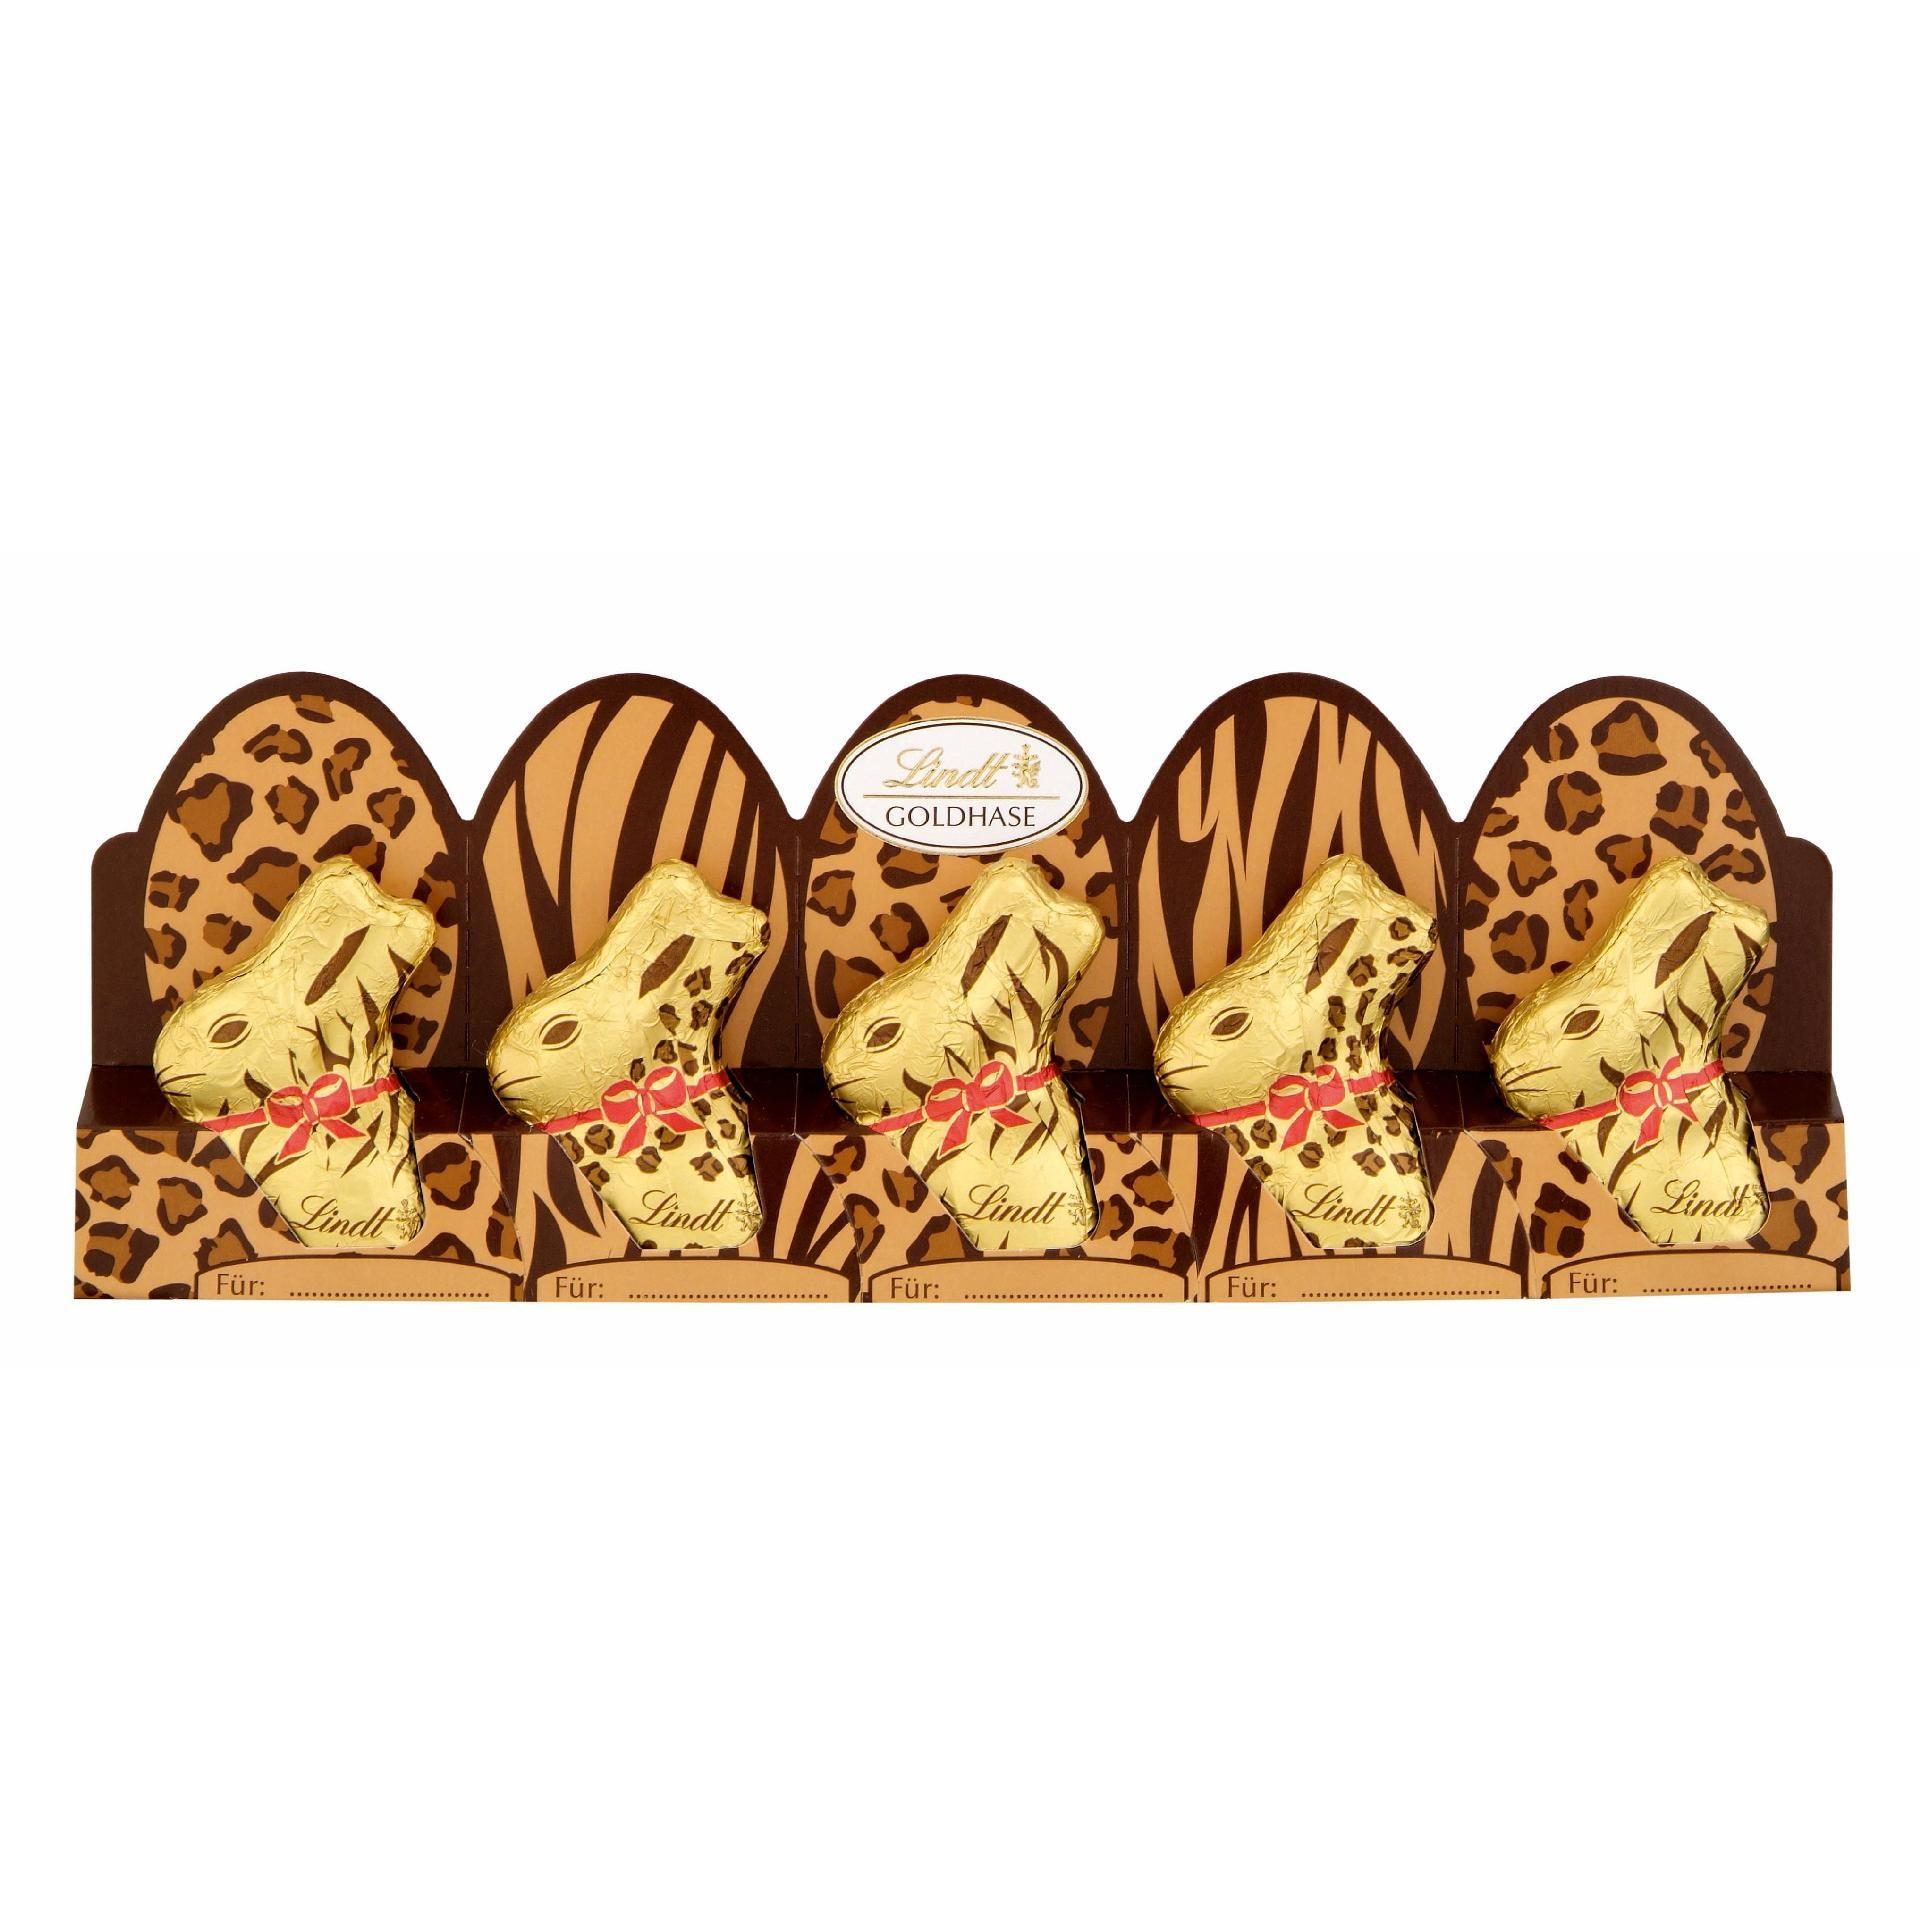 Lindt Mini-Goldhasen Edition Tiermuster 50g, 5 Stück